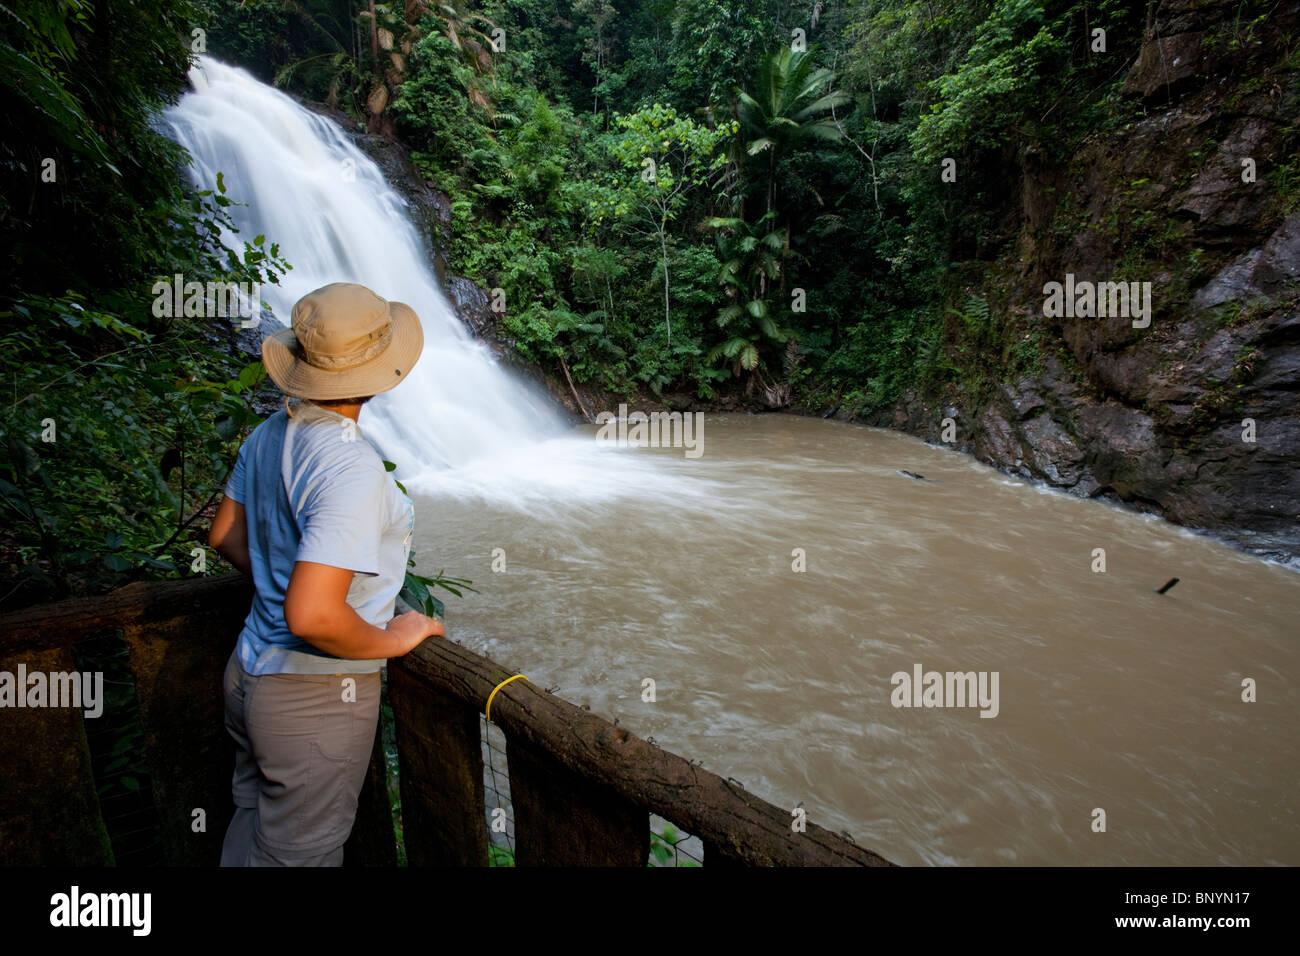 Female tourist watching the upper Kota Tinggi waterfall at the Gunung Panti Recreational forest cascading down. Stock Photo